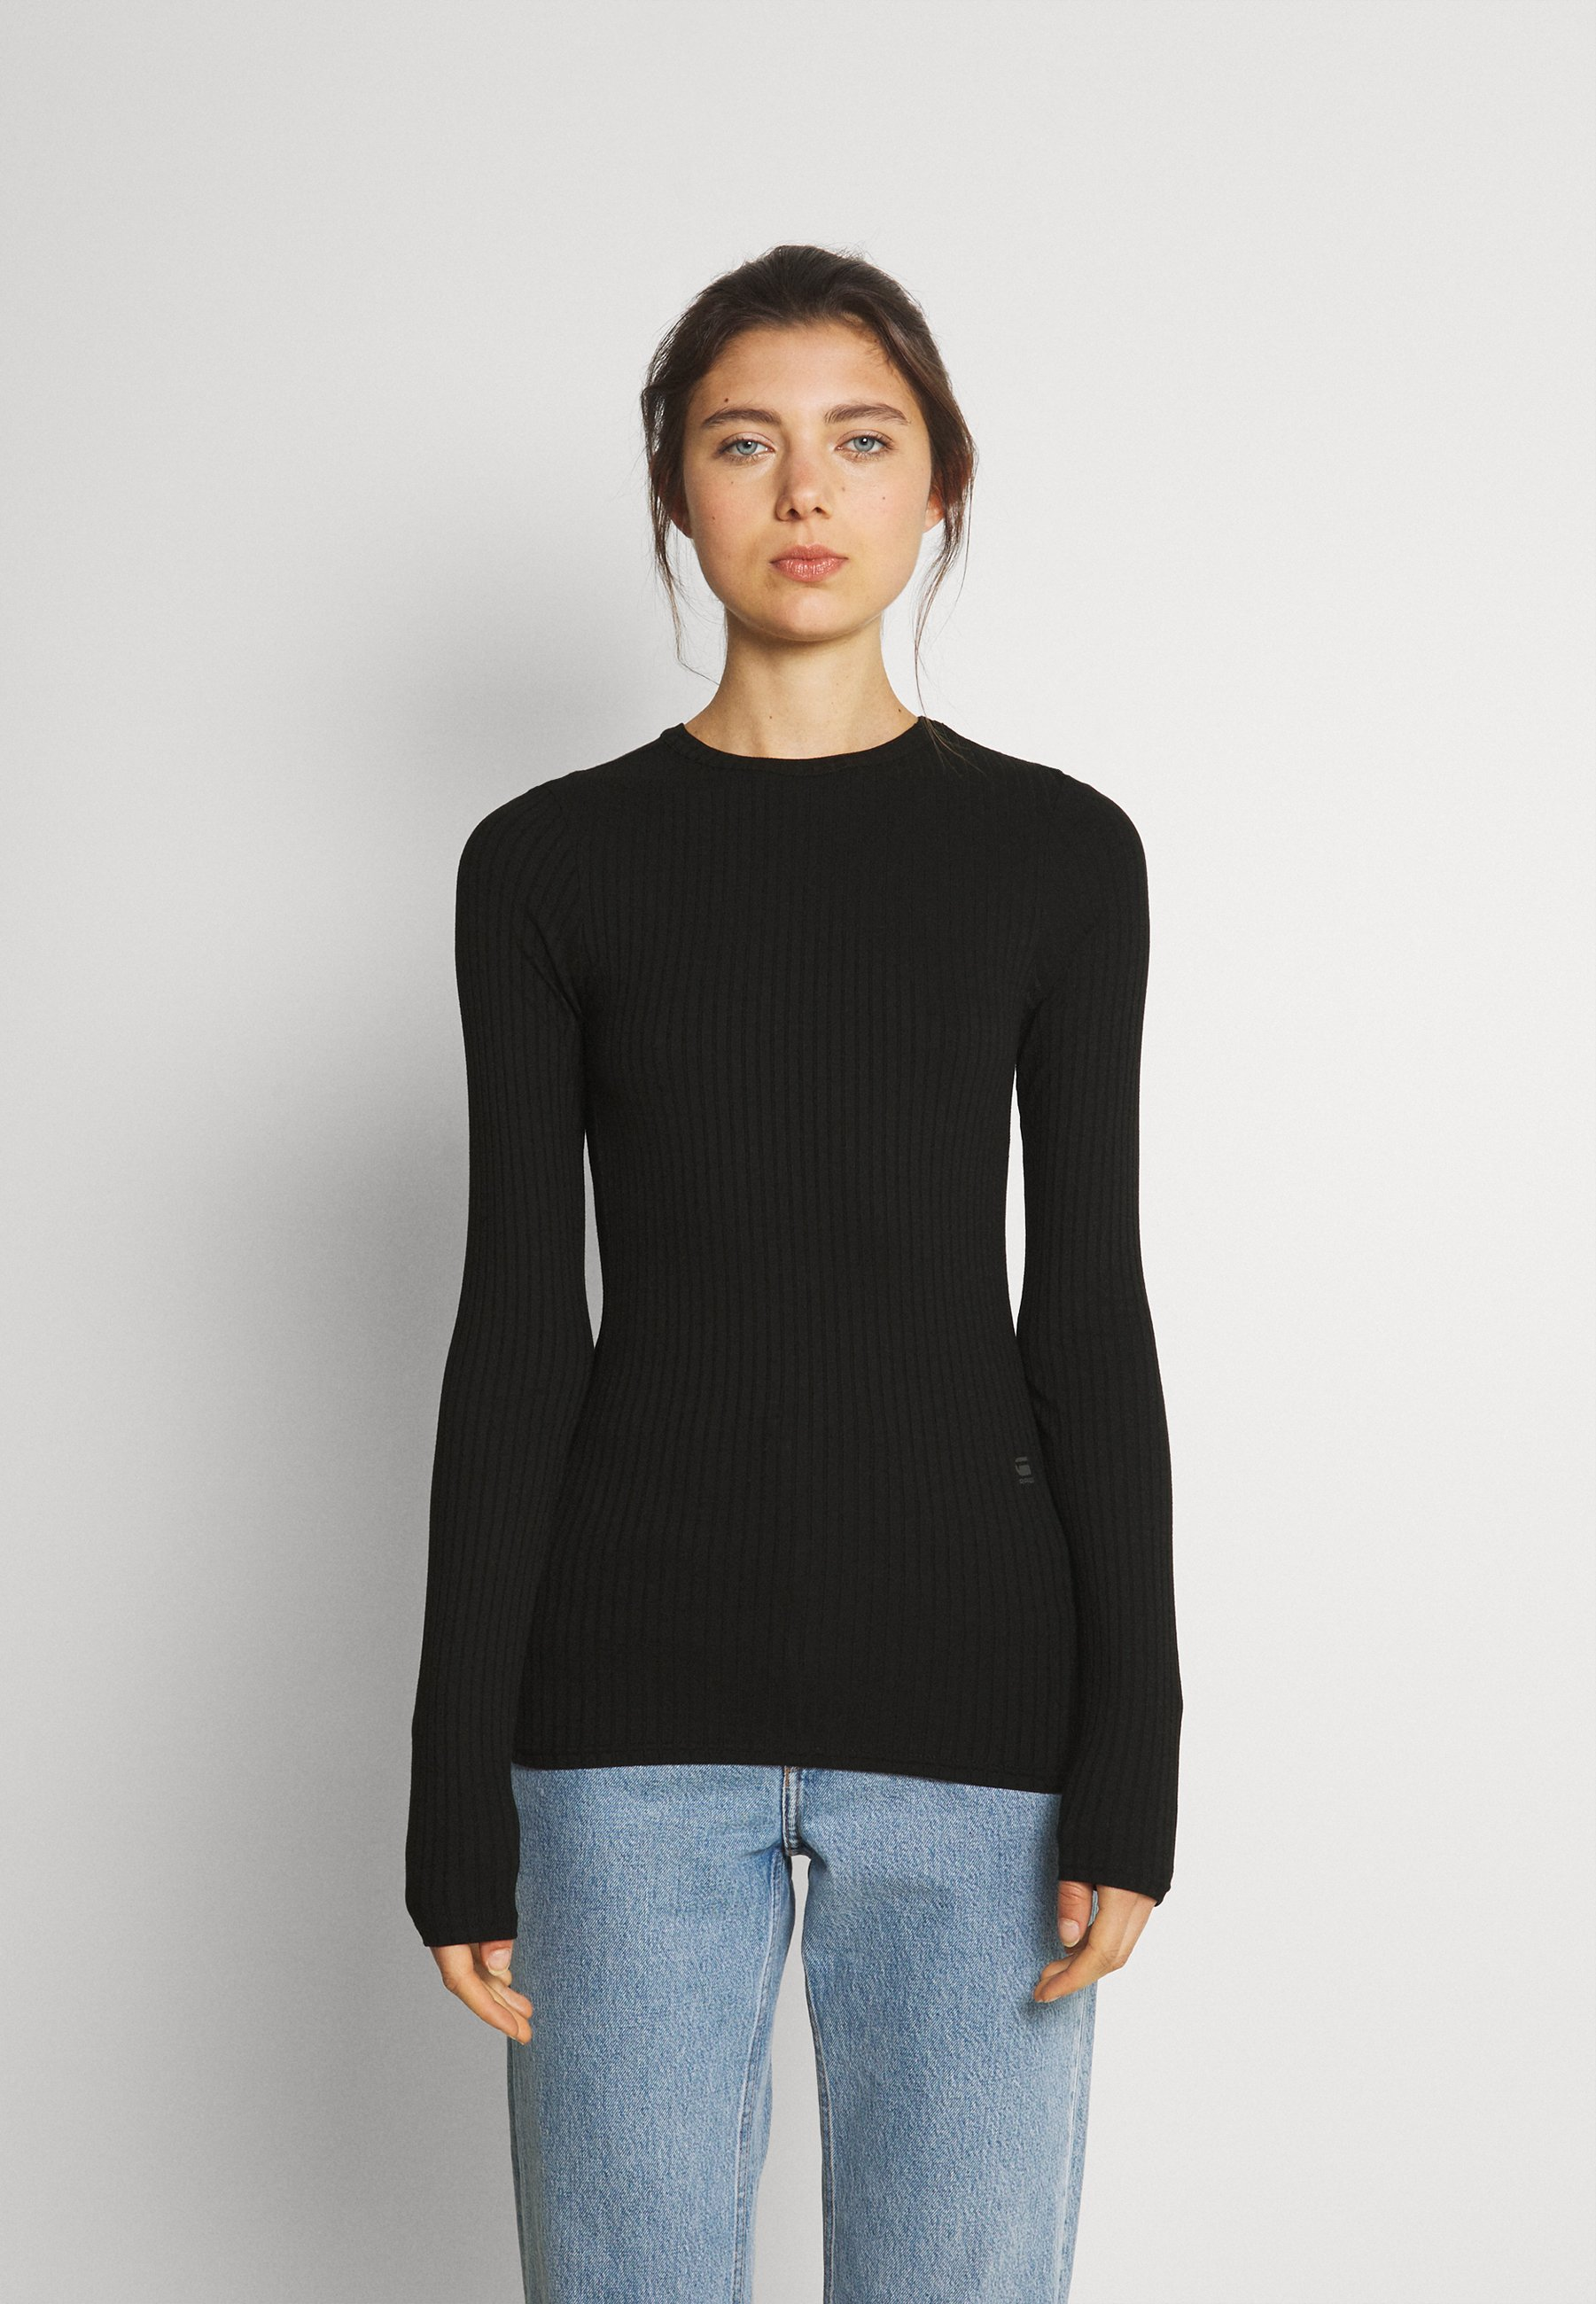 Donna SLIM RIB LONGSLEEVE - Maglietta a manica lunga